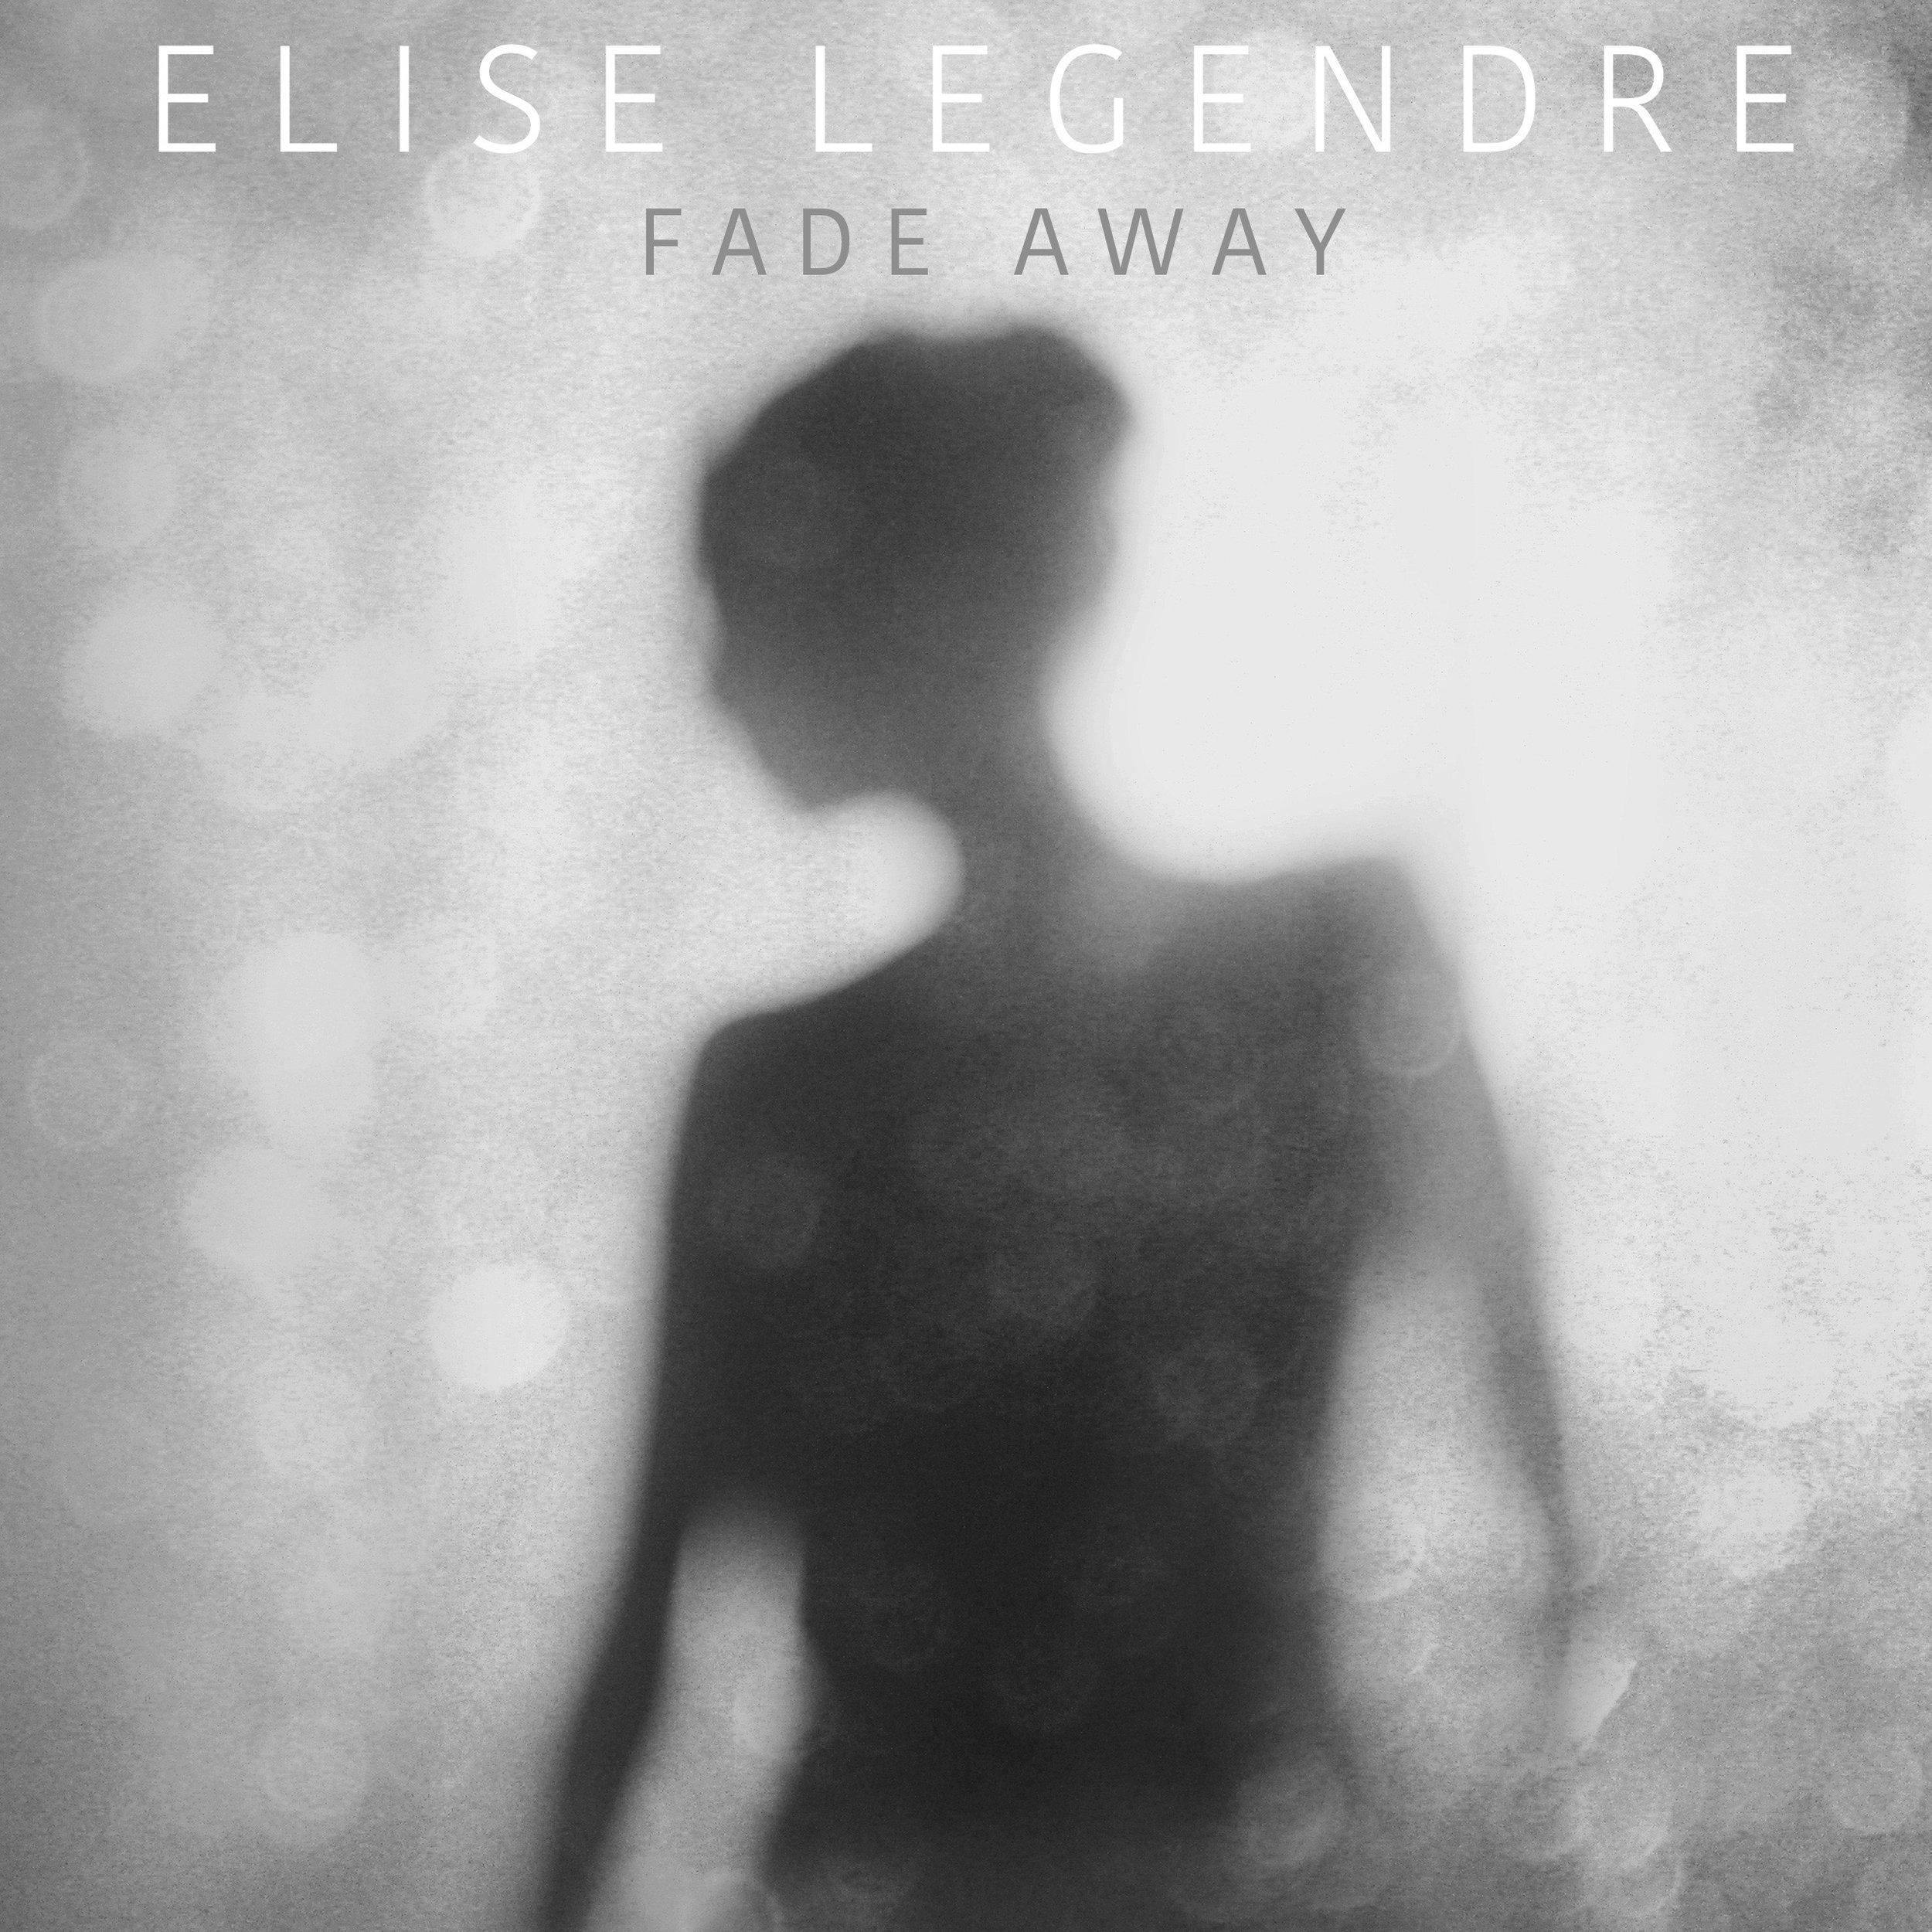 03 ELISE-LEGENDRE-FADE-AWAY-SLEEVE_edited-2.jpg